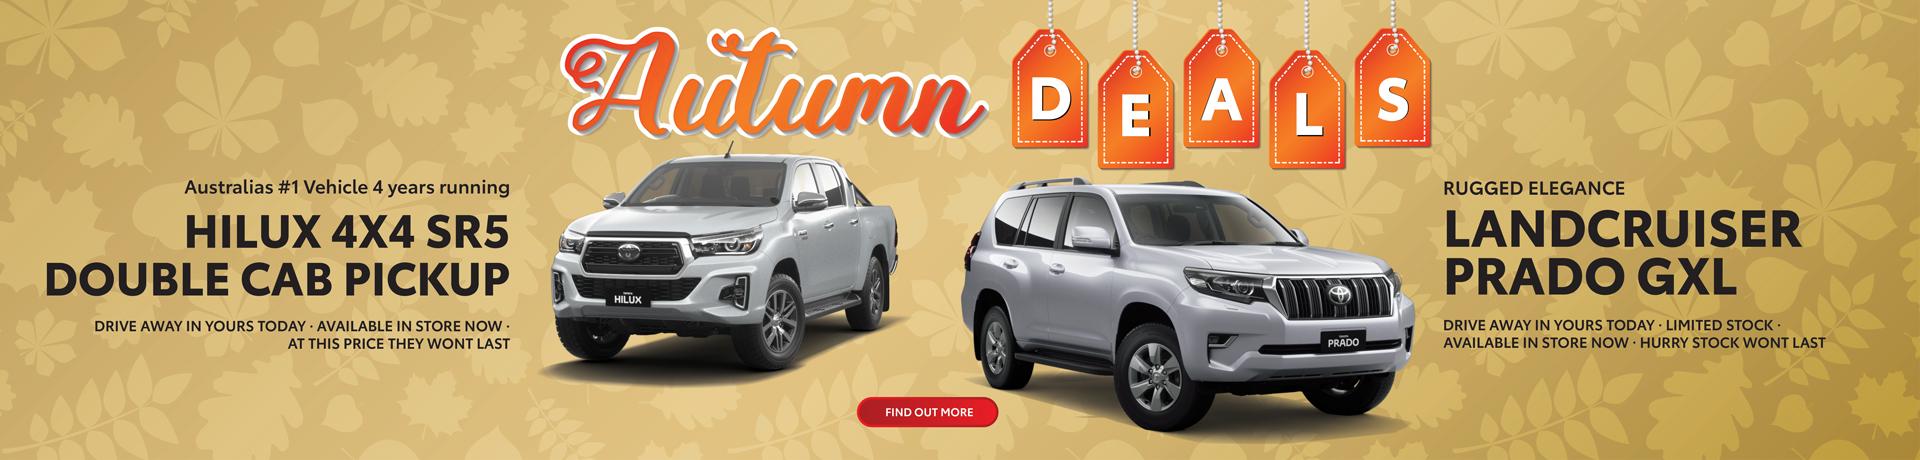 Autumn Deals at John Cole Toyota